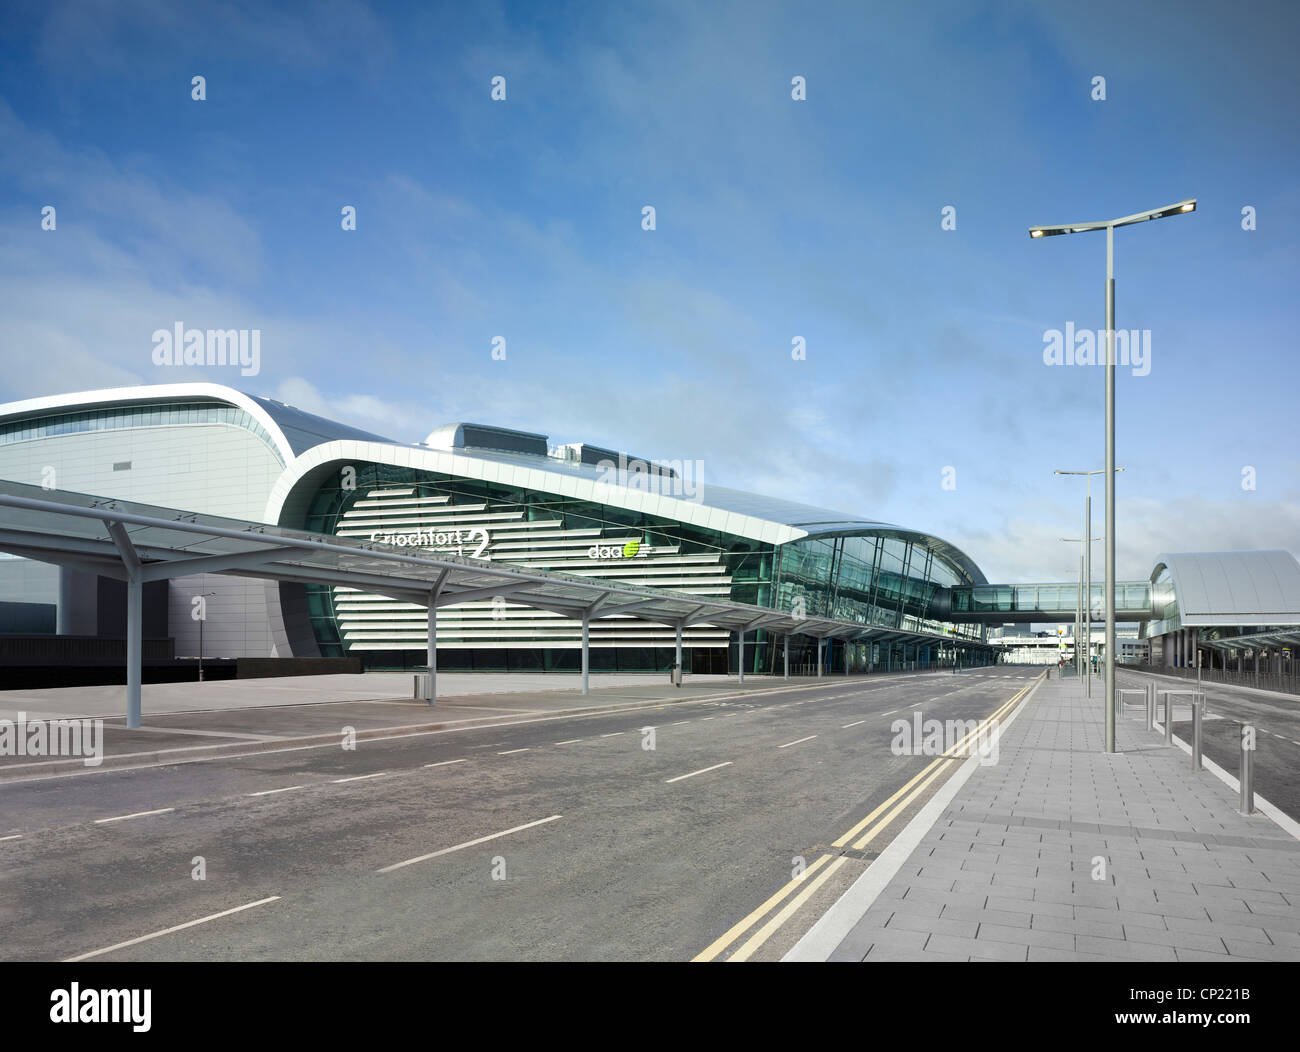 Dublin Airport, Terminal 2. - Stock Image